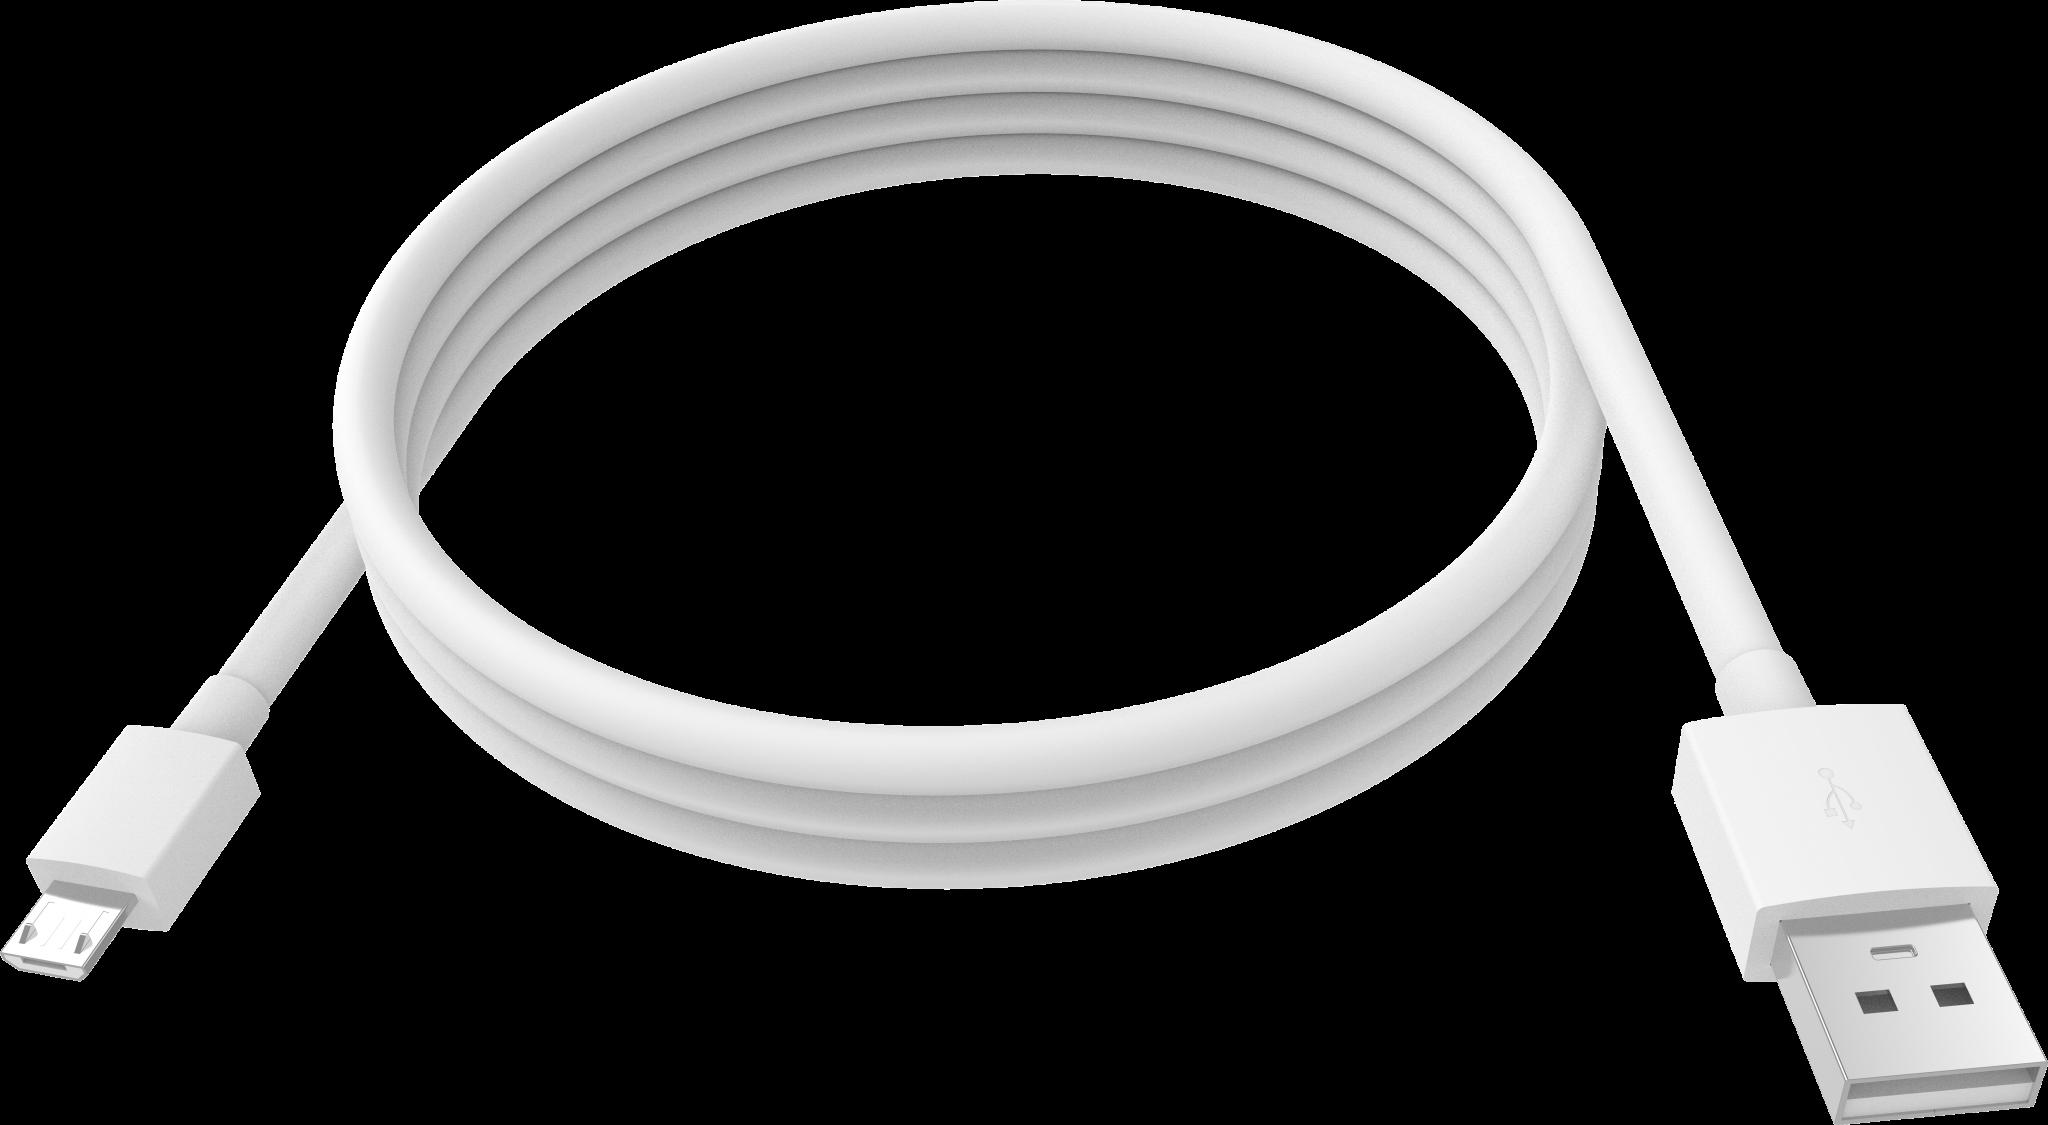 Usb Cable And Adaptors Signals Micro 20